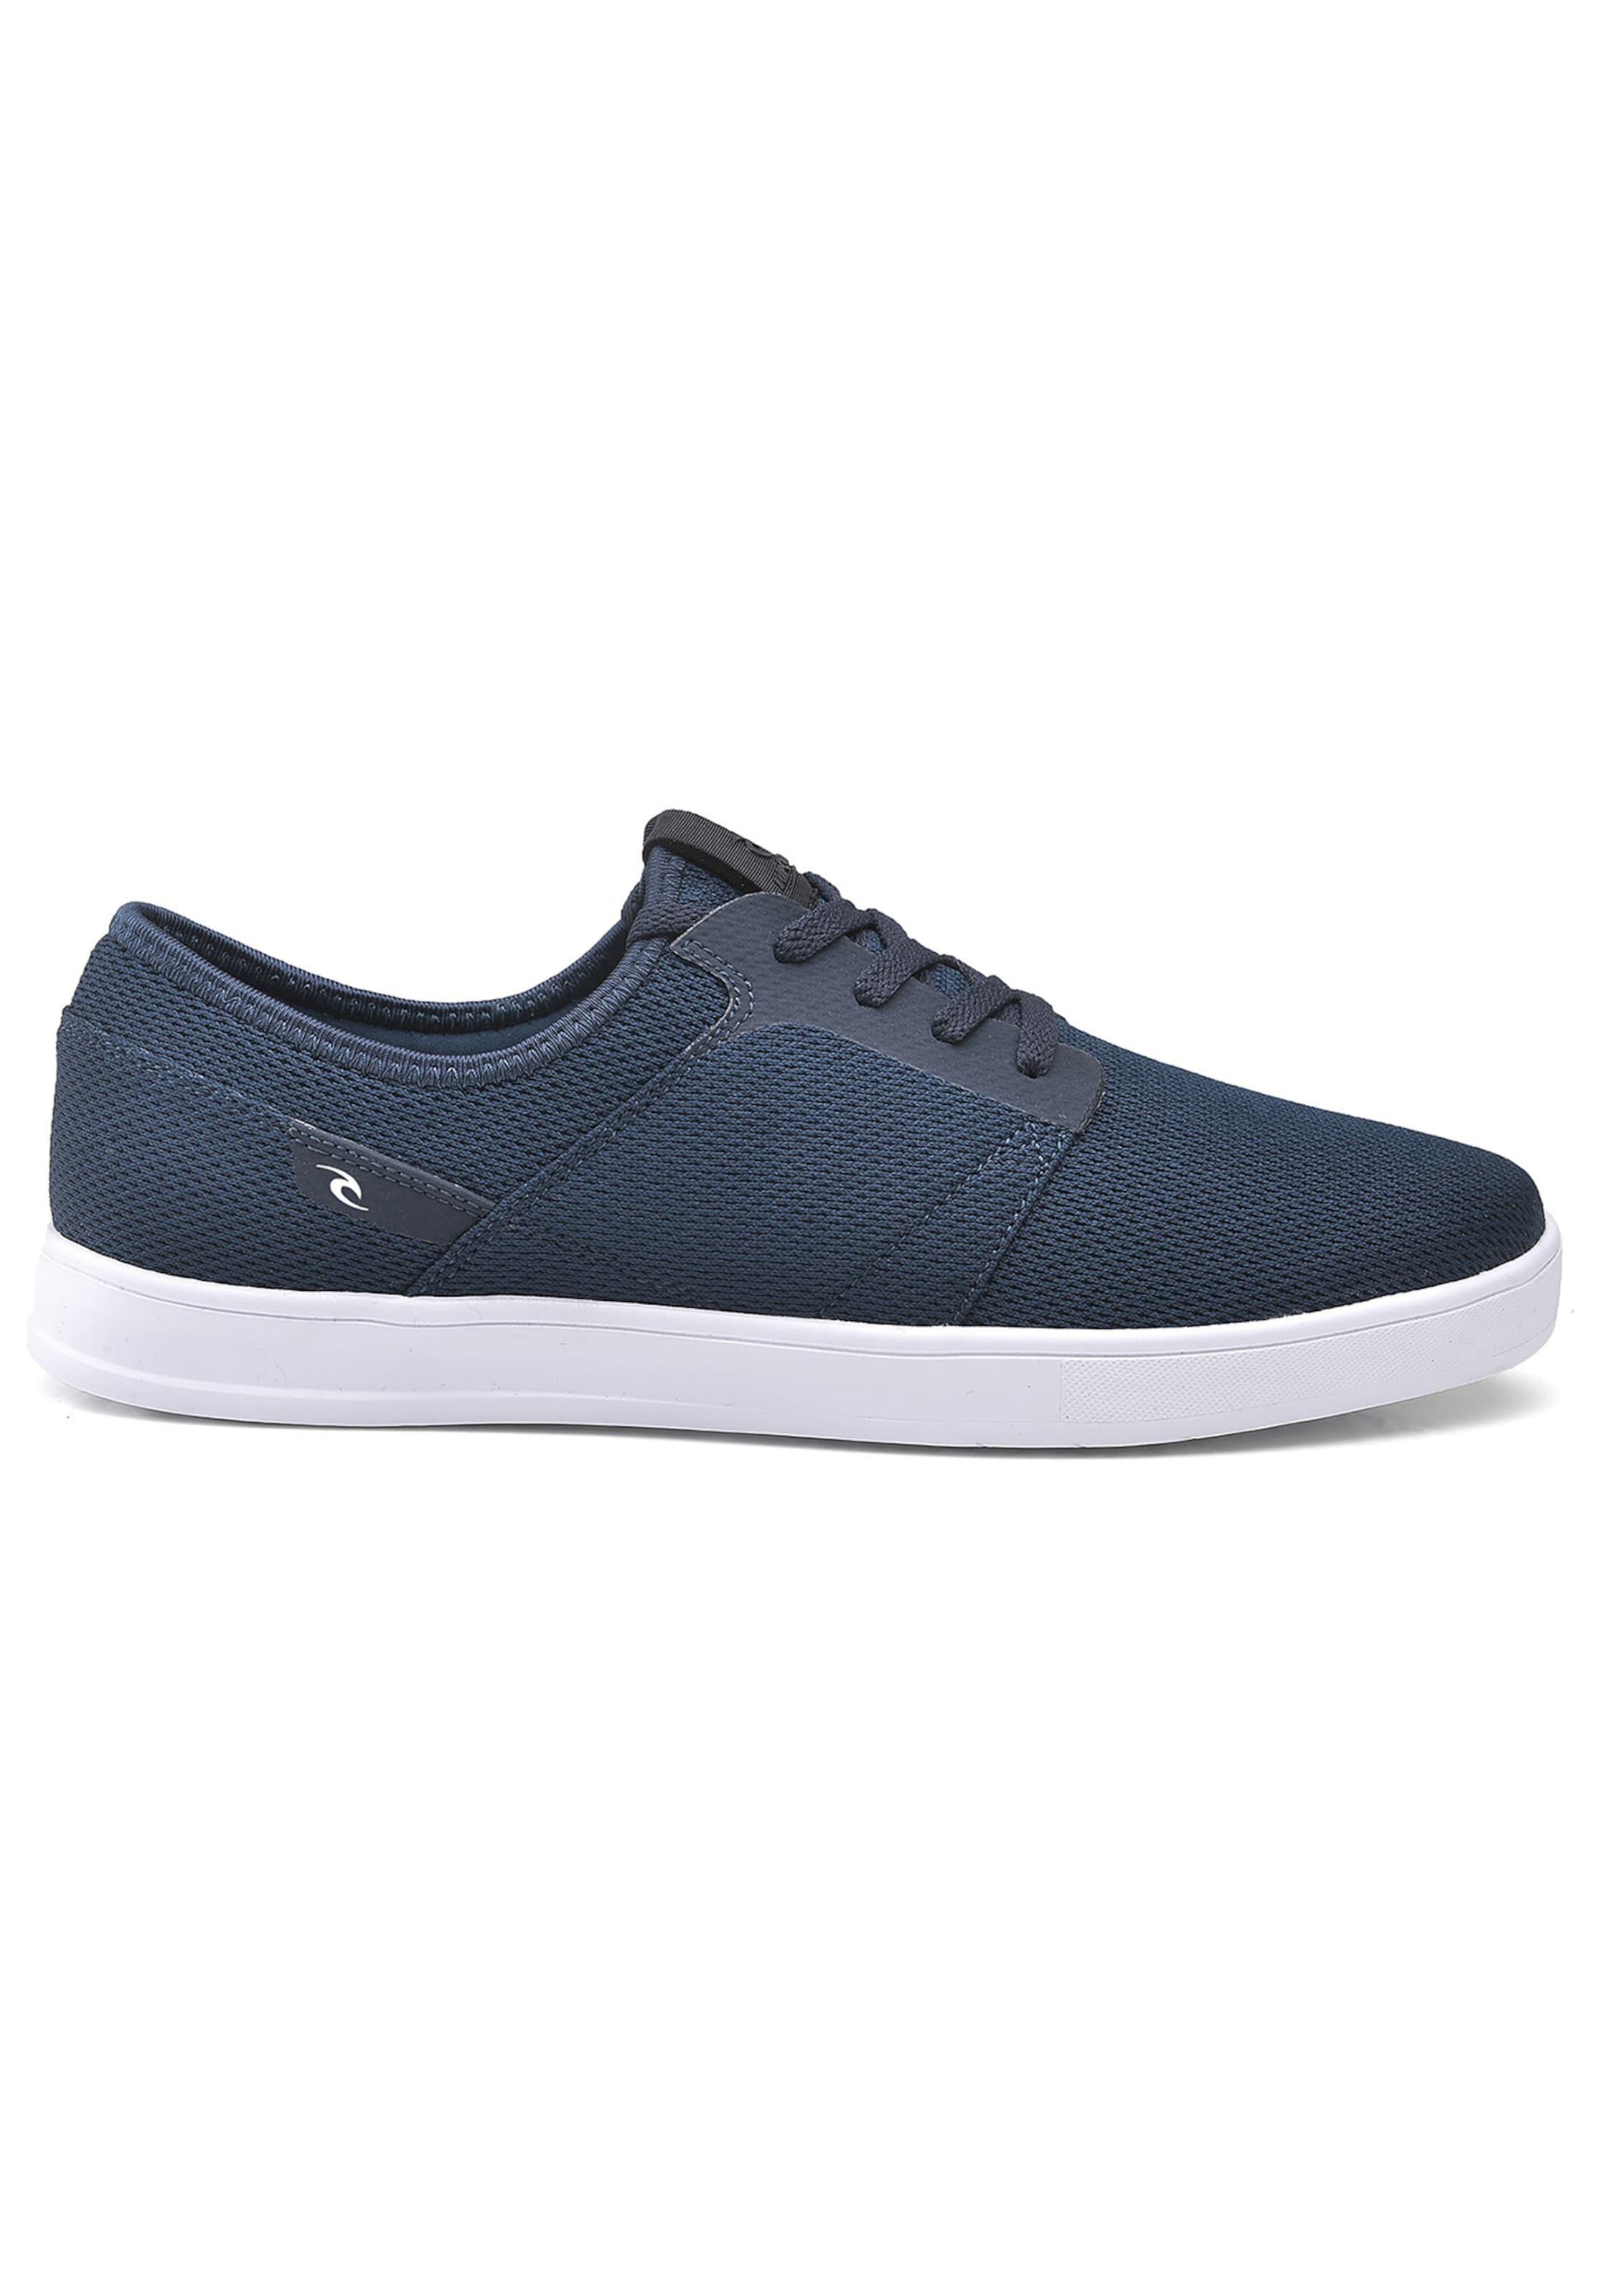 RIP CURL Raglan Sneaker Verschleißfeste billige Schuhe